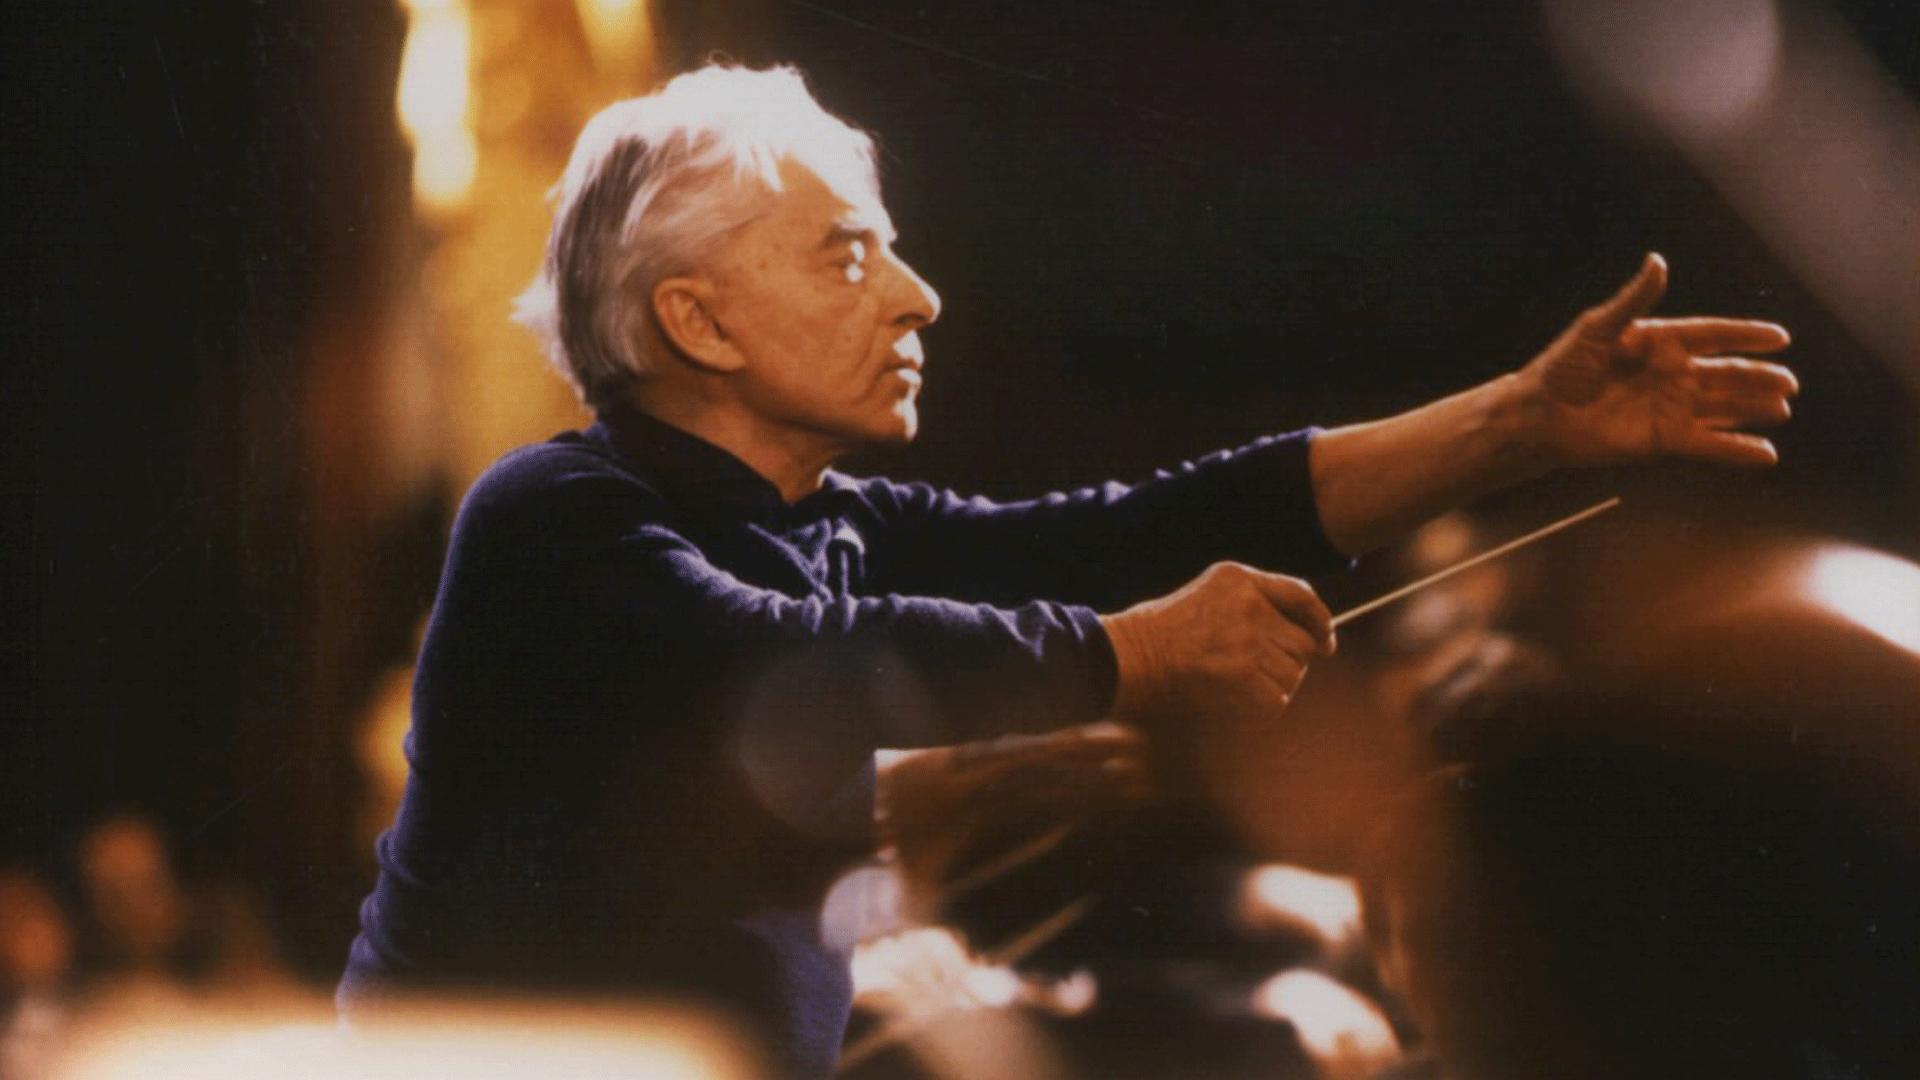 Herbert von Karajan dirige la Symphonie n°6 de Beethoven, dite « Pastorale »